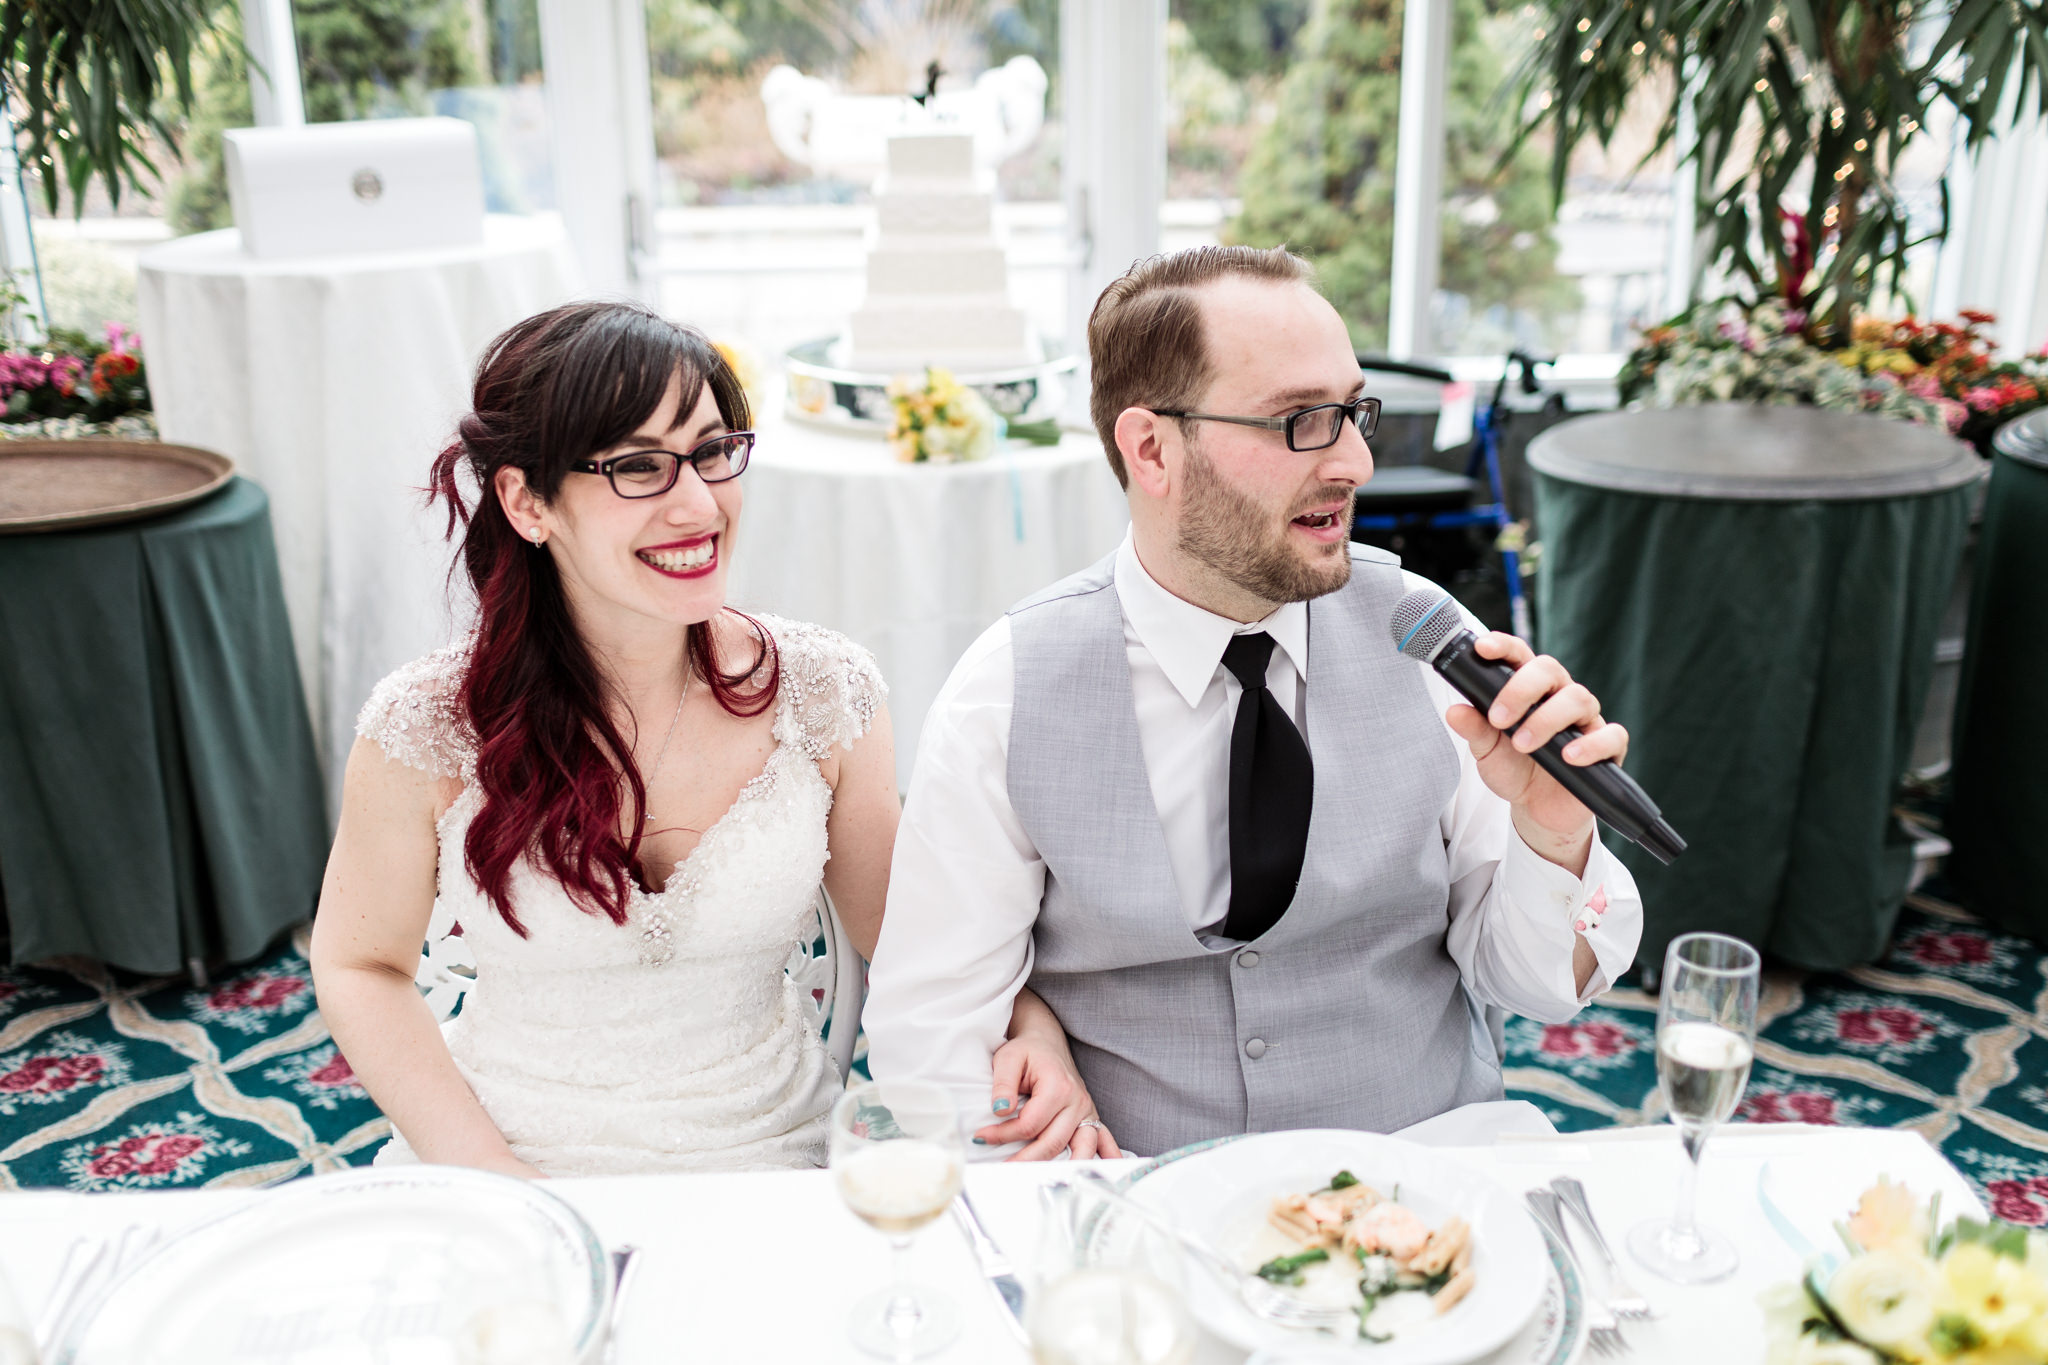 Hanchar_Madison_Hotel_NJ_Wedding_7R5A8892.jpg